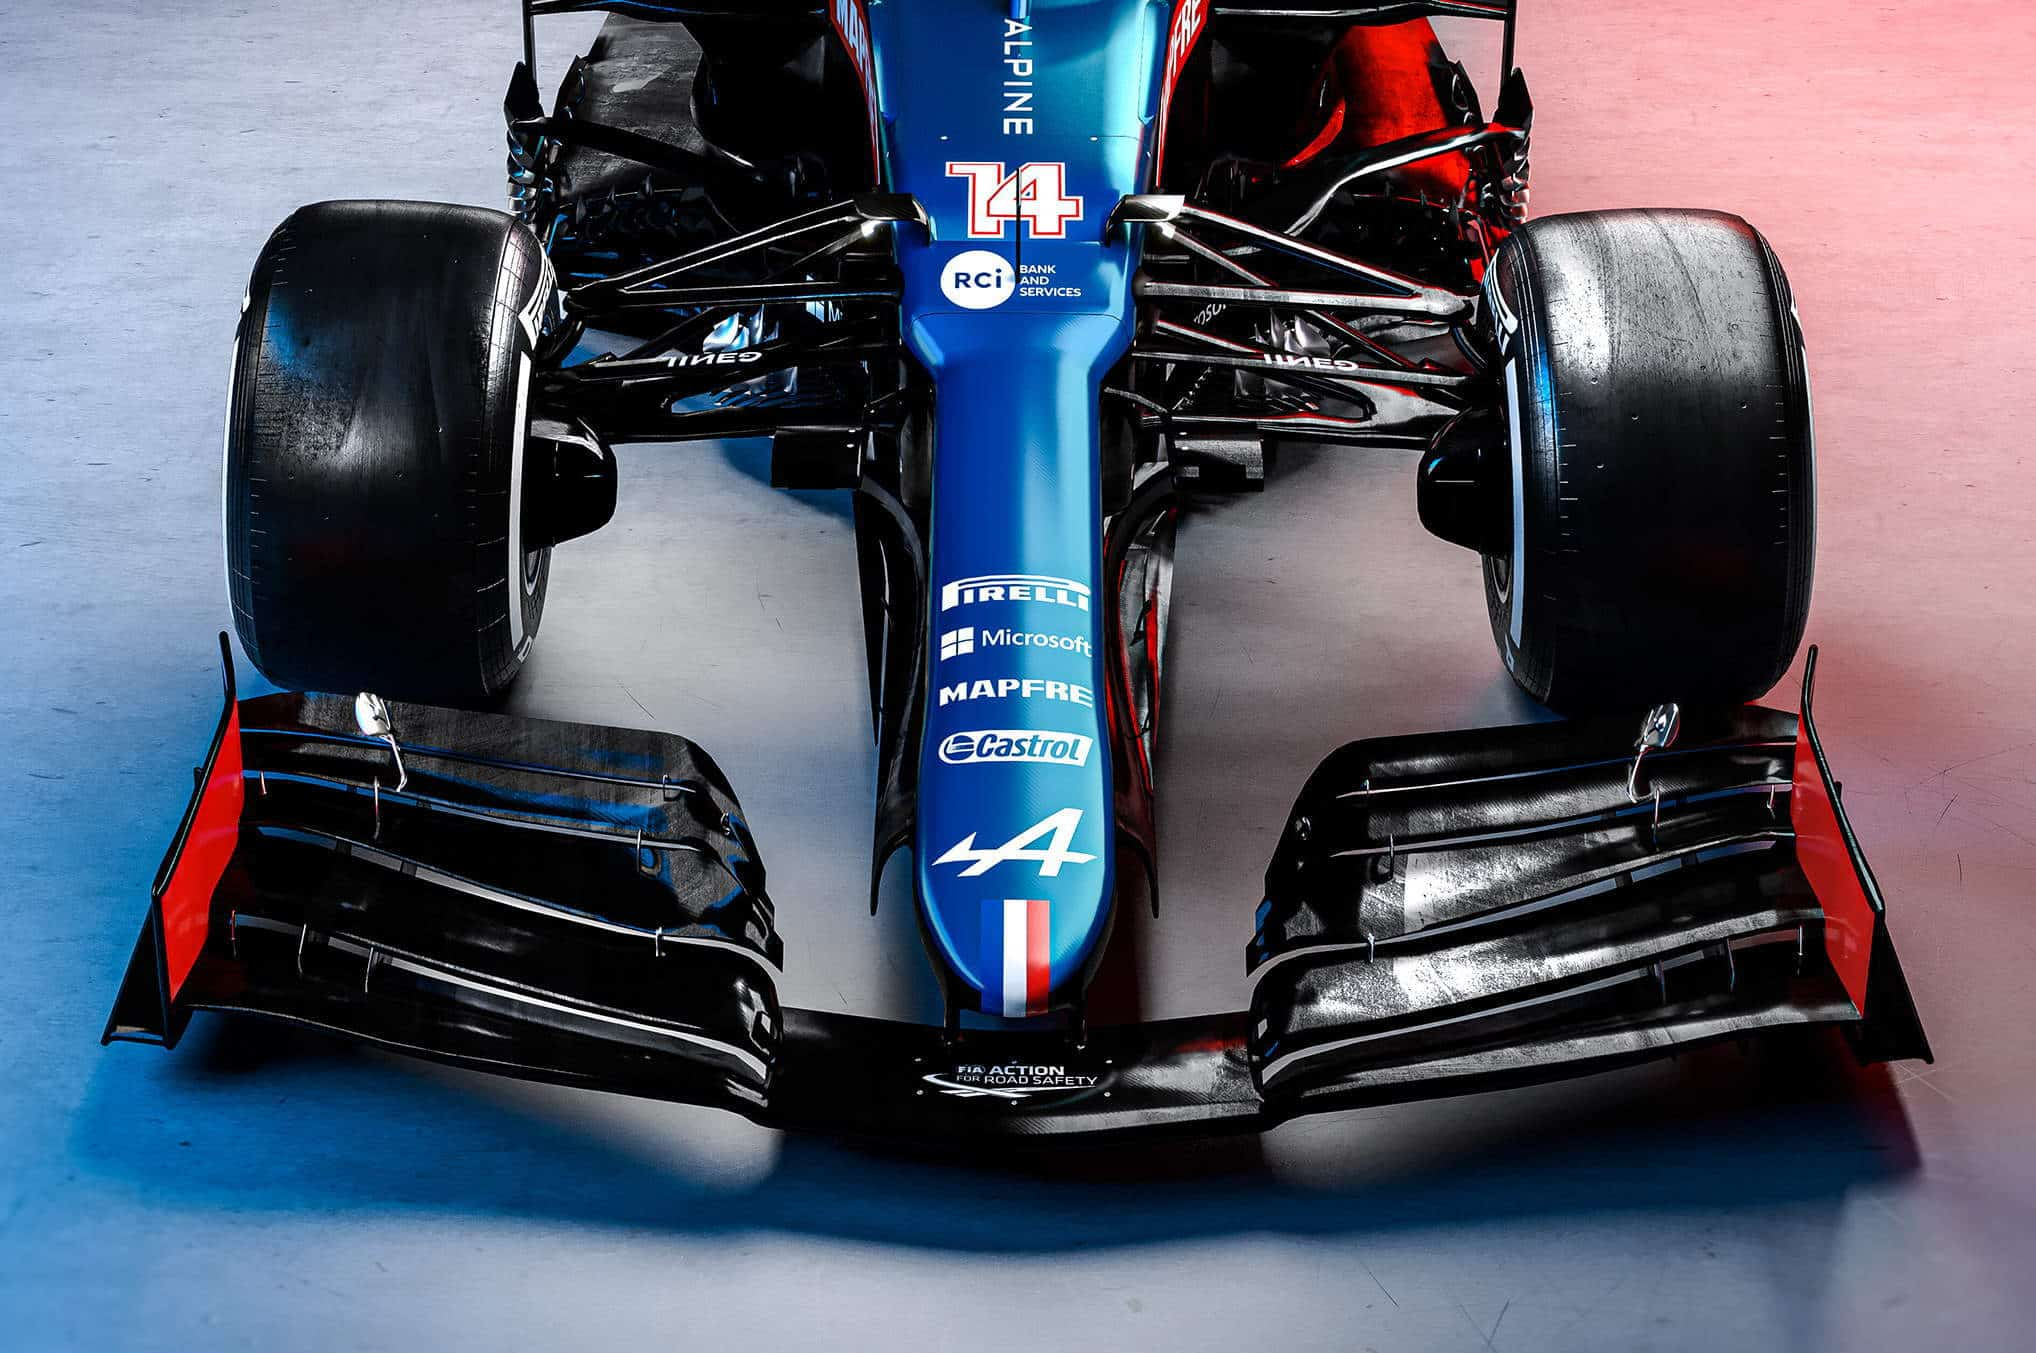 2021 Alpine F1 2021 car AT521 front hi res Photo Alpine